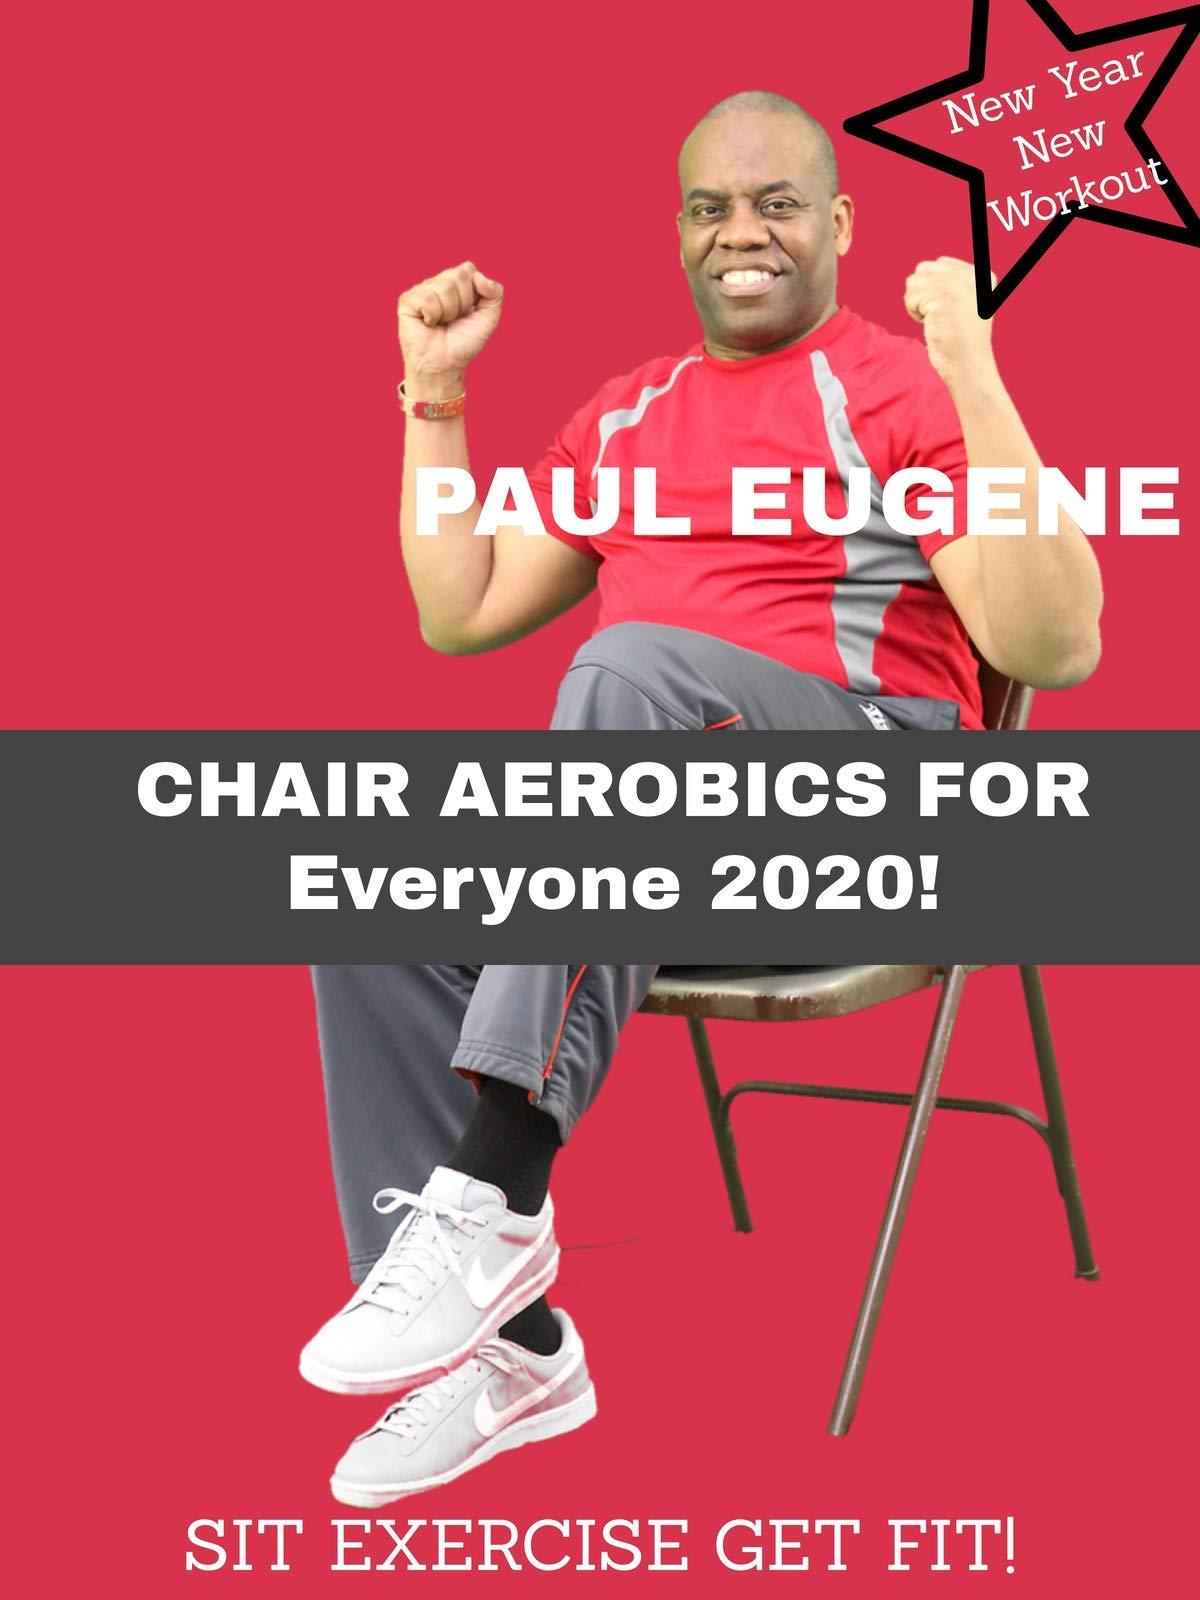 Chair Aerobics For Everyone 2020